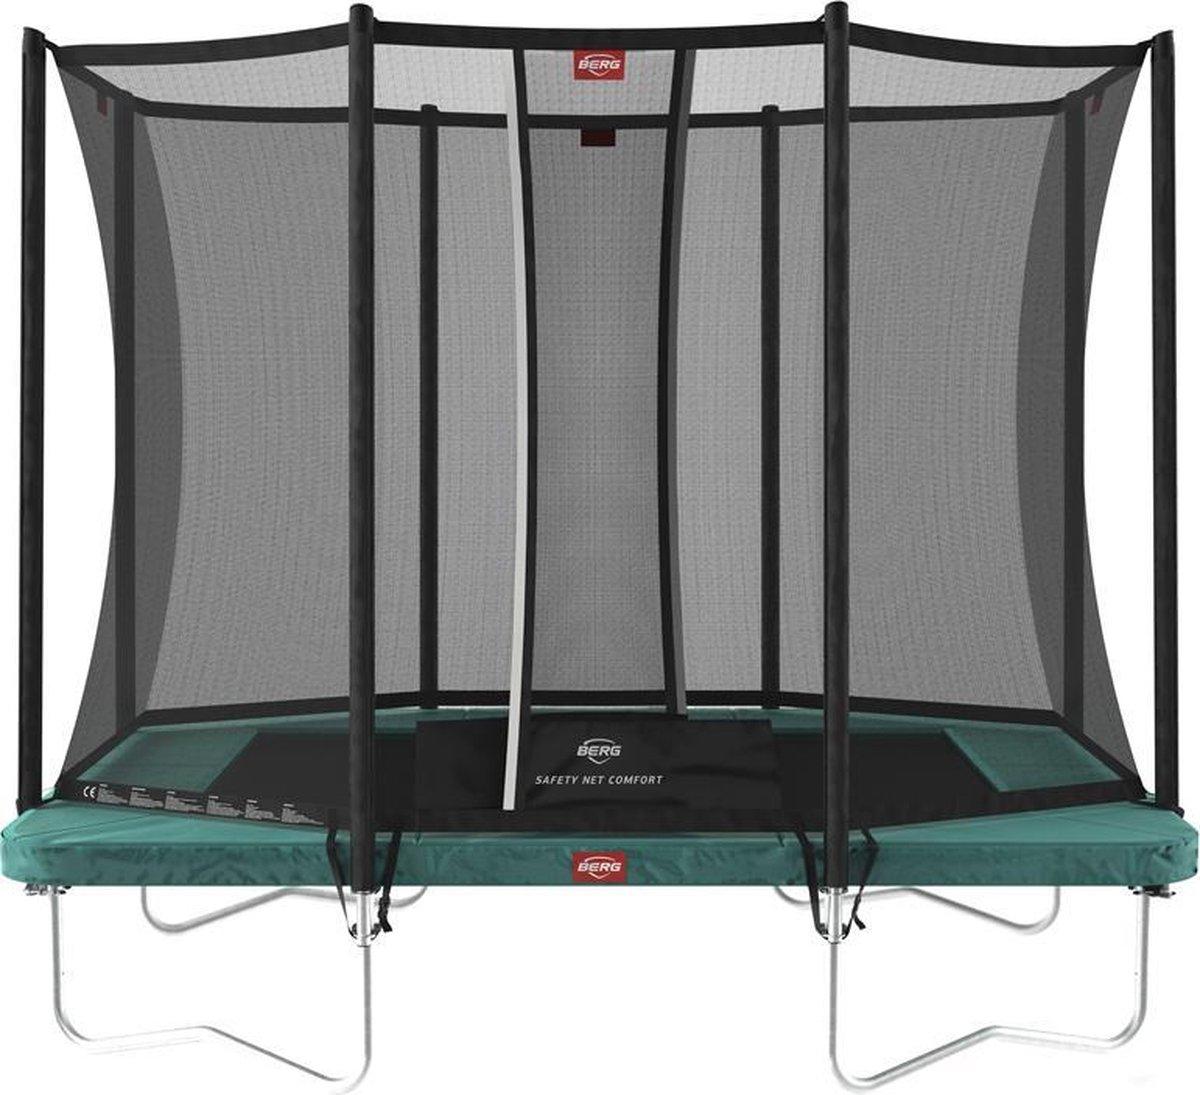 Trampoline - BERG Ultim Favorit 190 x 280 cm + Safety Net Comfort - Groen